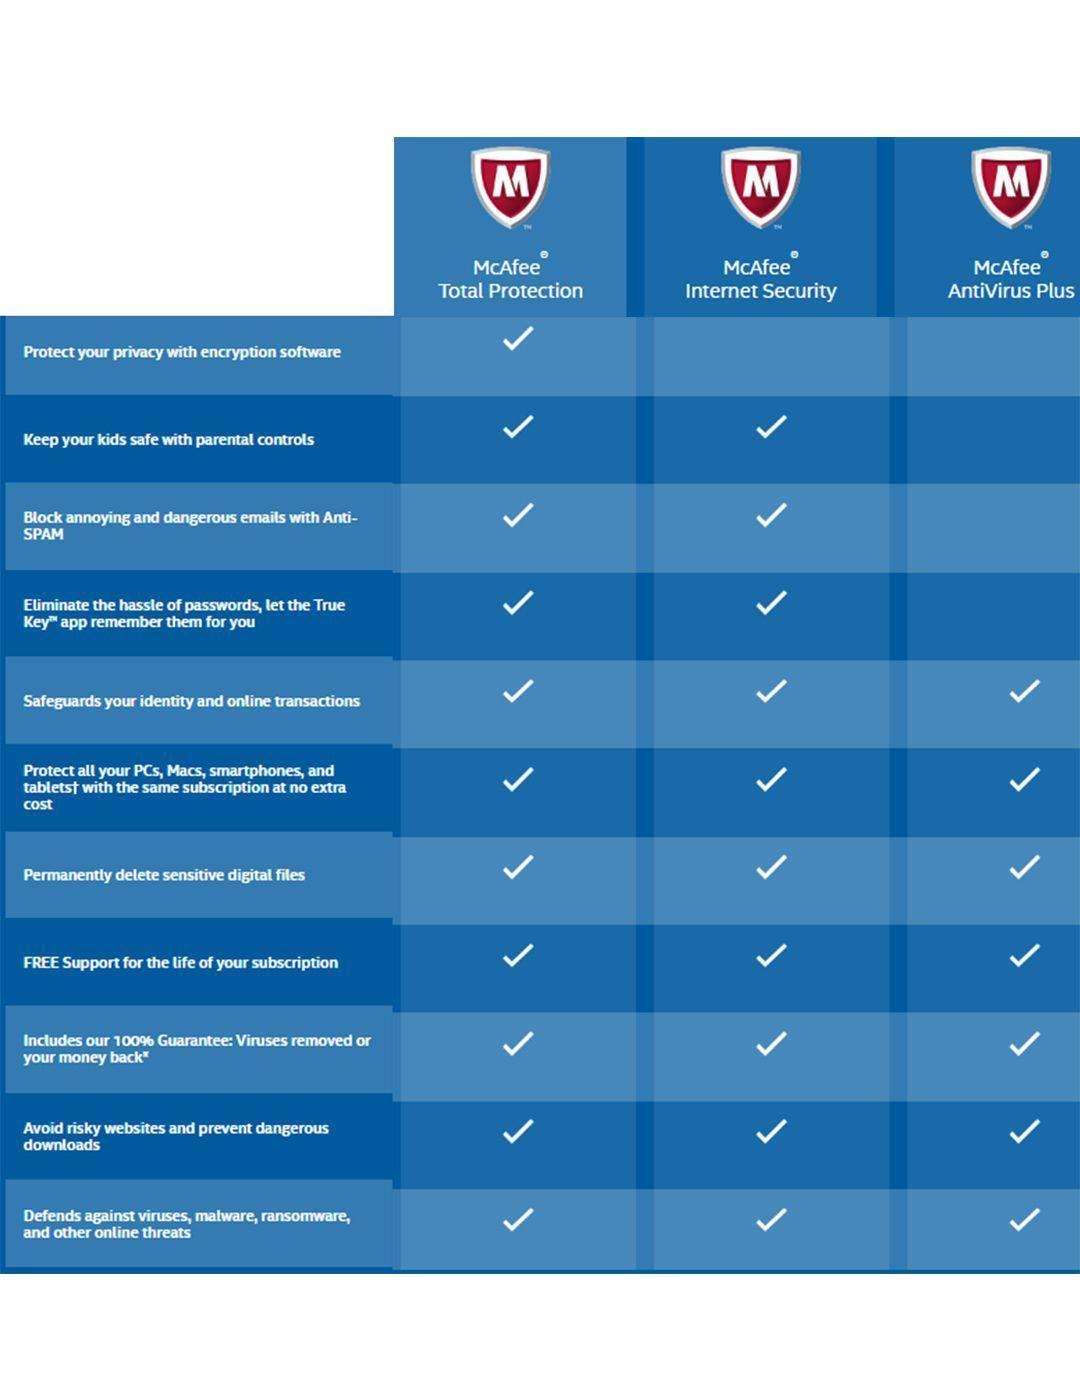 McAfee AntiVirus Plus 2019 -2 Years -1 and 25 similar items